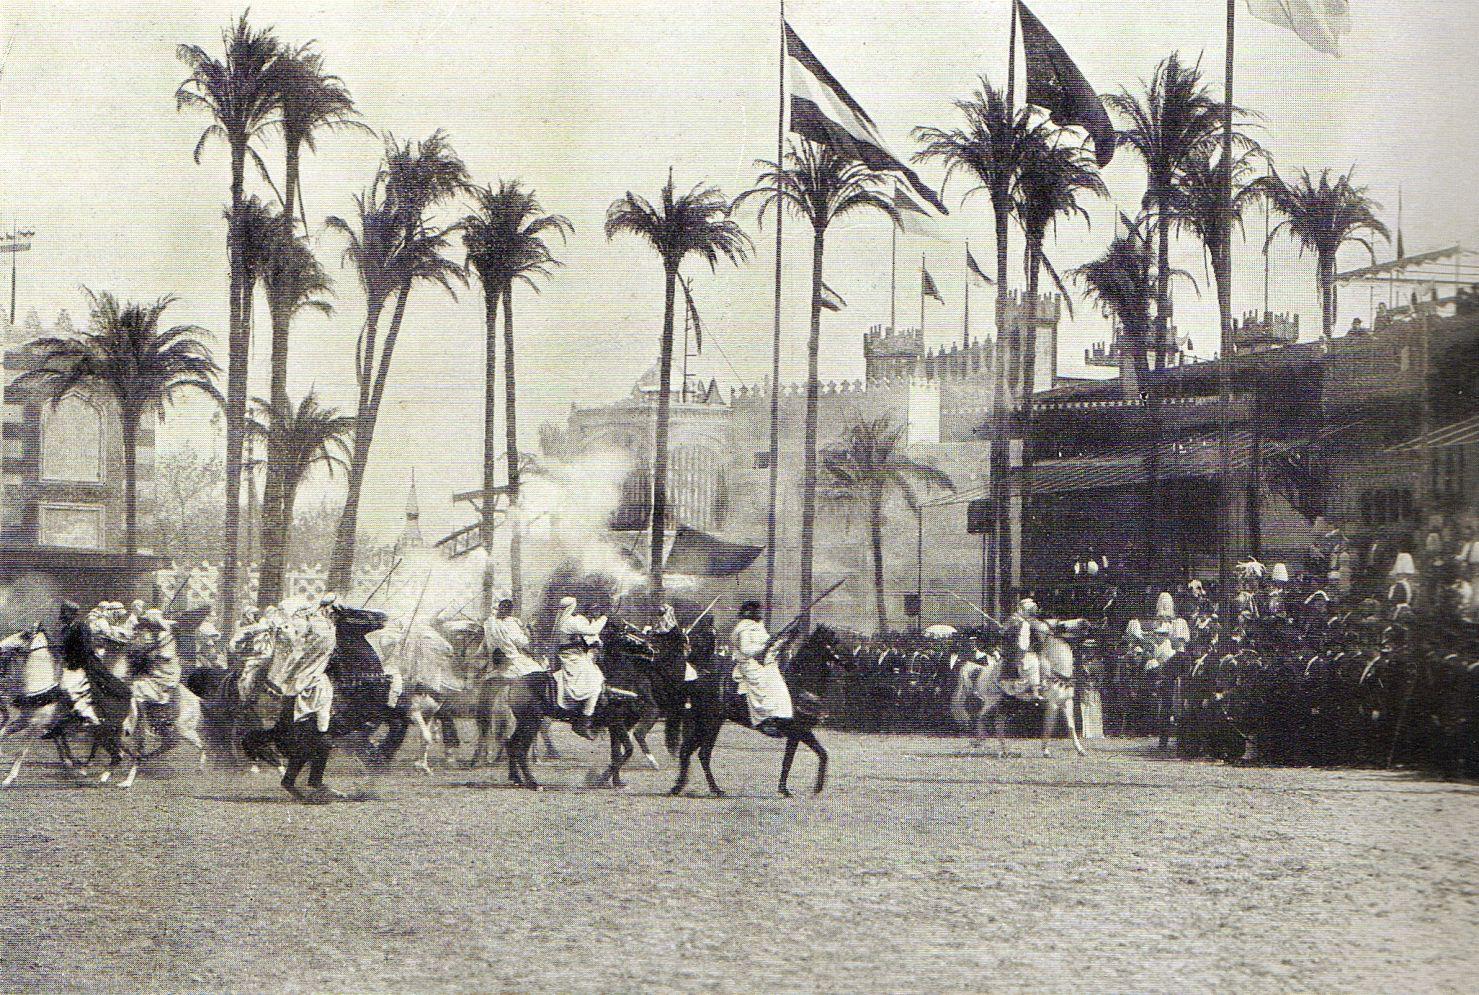 Berlin, Gewerbeausstellung 1896, Parade der Beduinen vor Kaiser Wilhelm II, Fotograf unbekannt